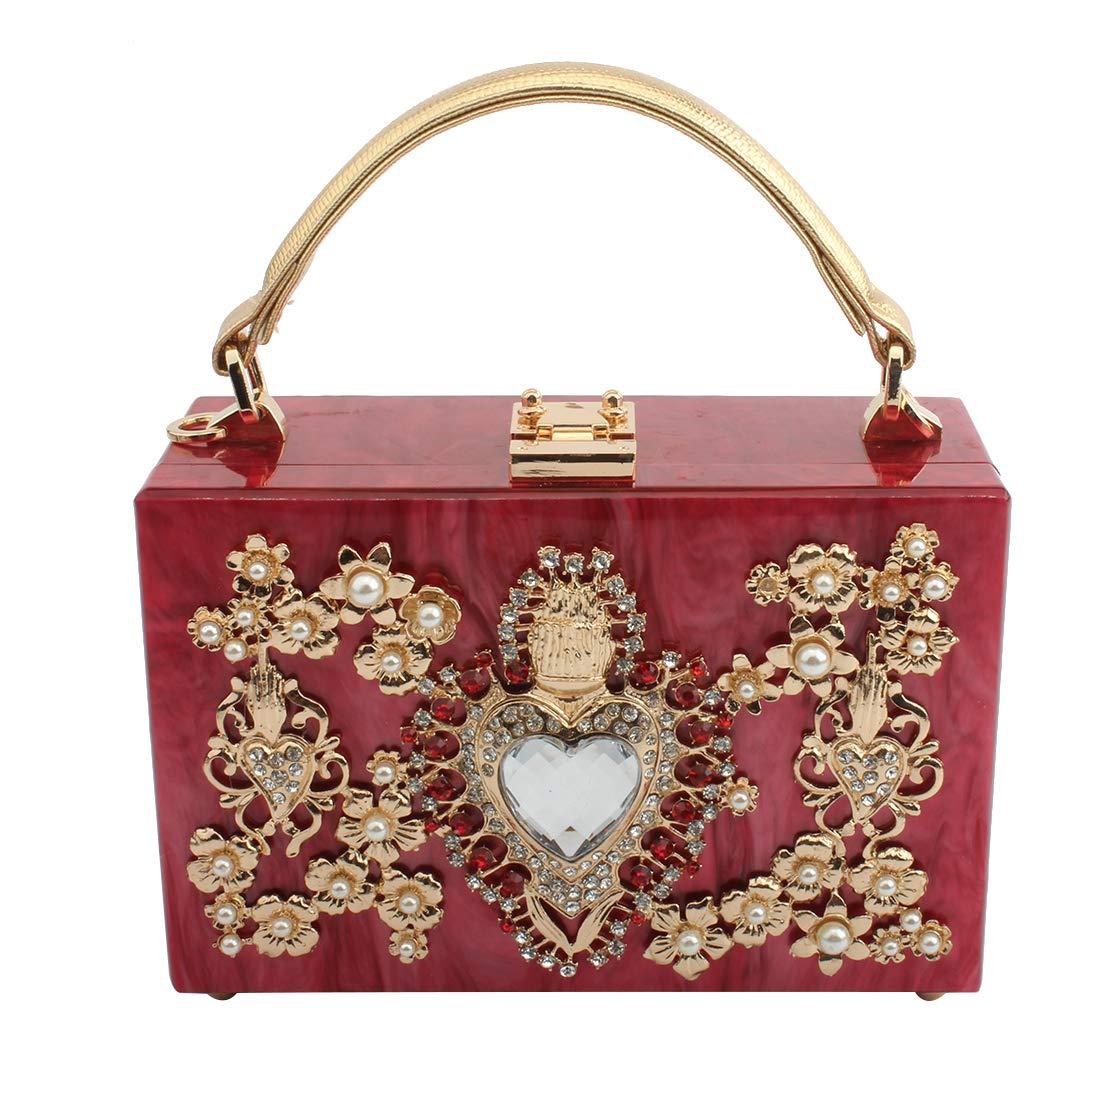 LETODE Women' Sparkling Crystal Clutch Purse Elegant Acrylic Evening Bags Wedding Party Handbag Pursey (RED)